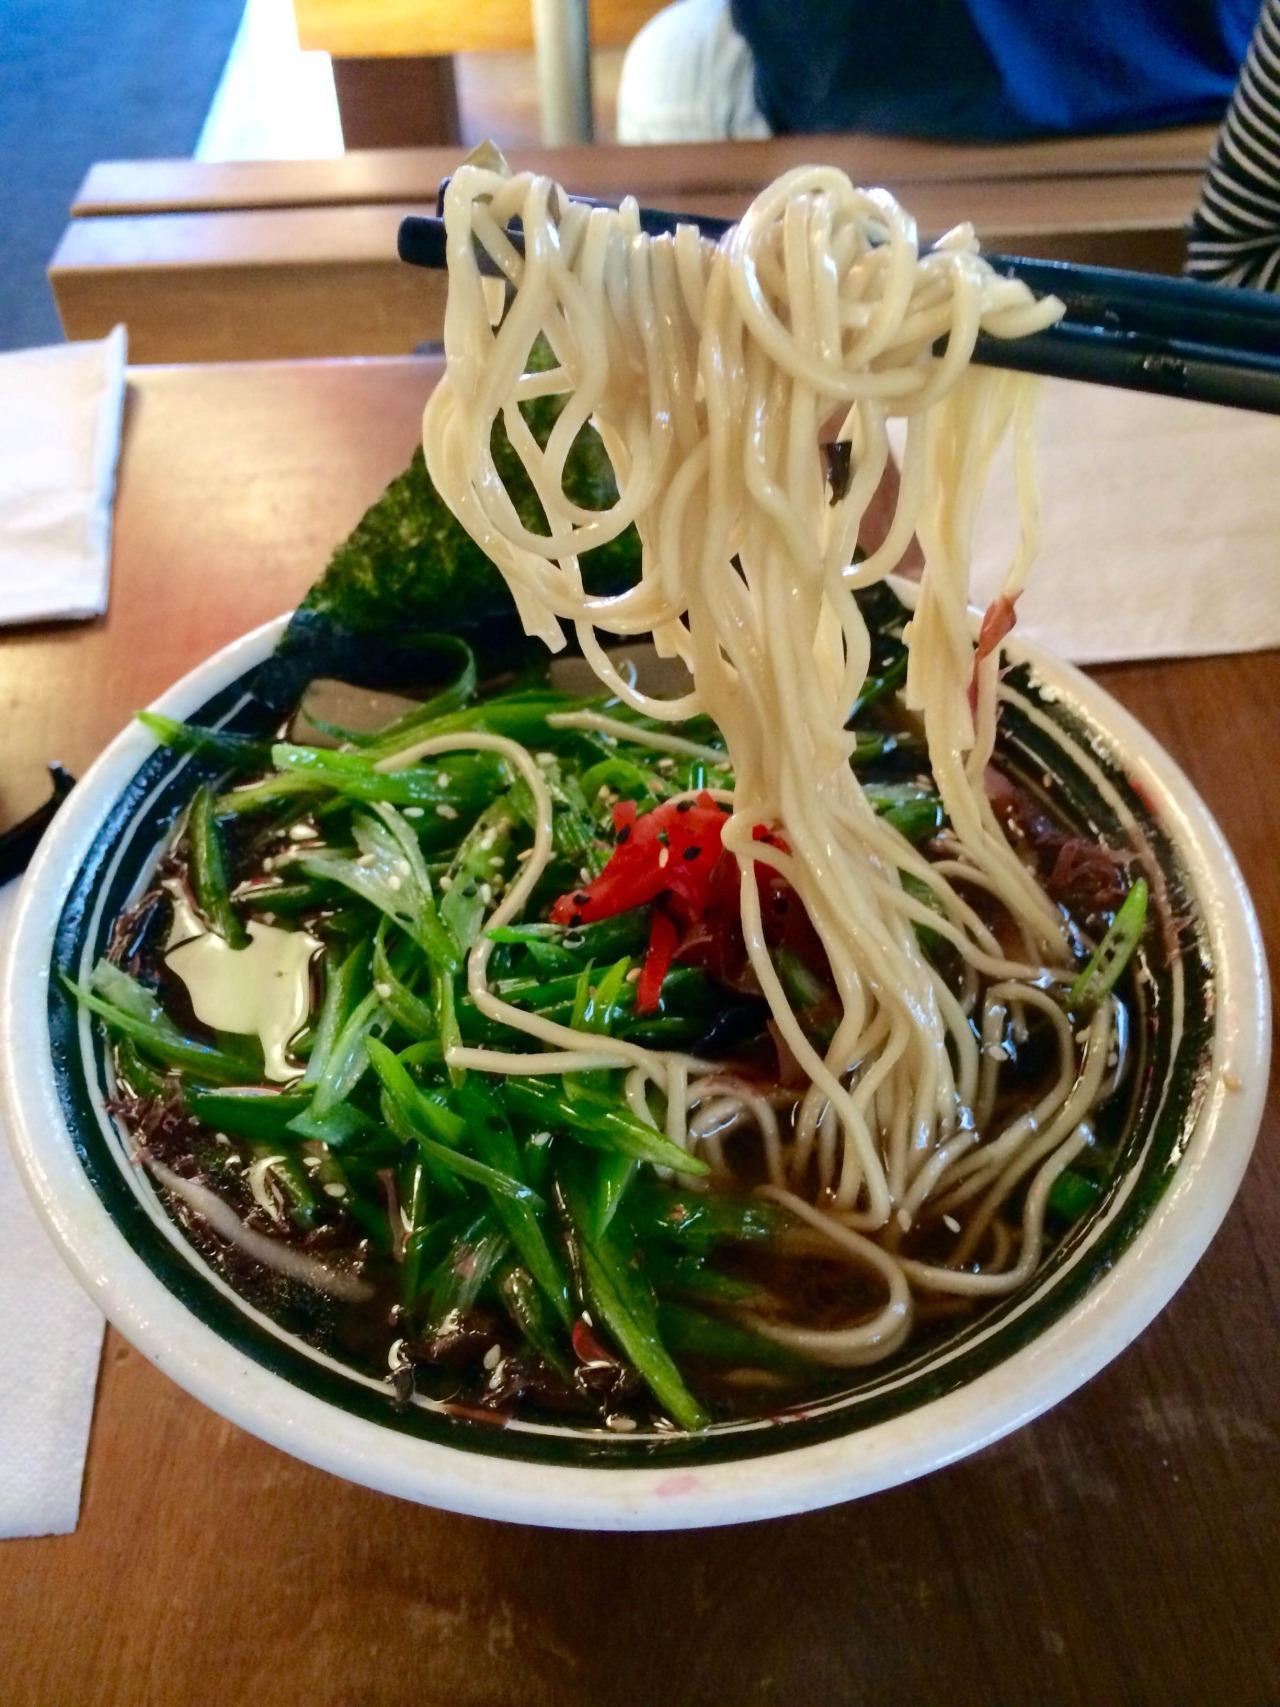 V eggie Shoyu Ramen - Tosaka, seaweed, scallion, sesame, bamboo shoot, and dikon radish